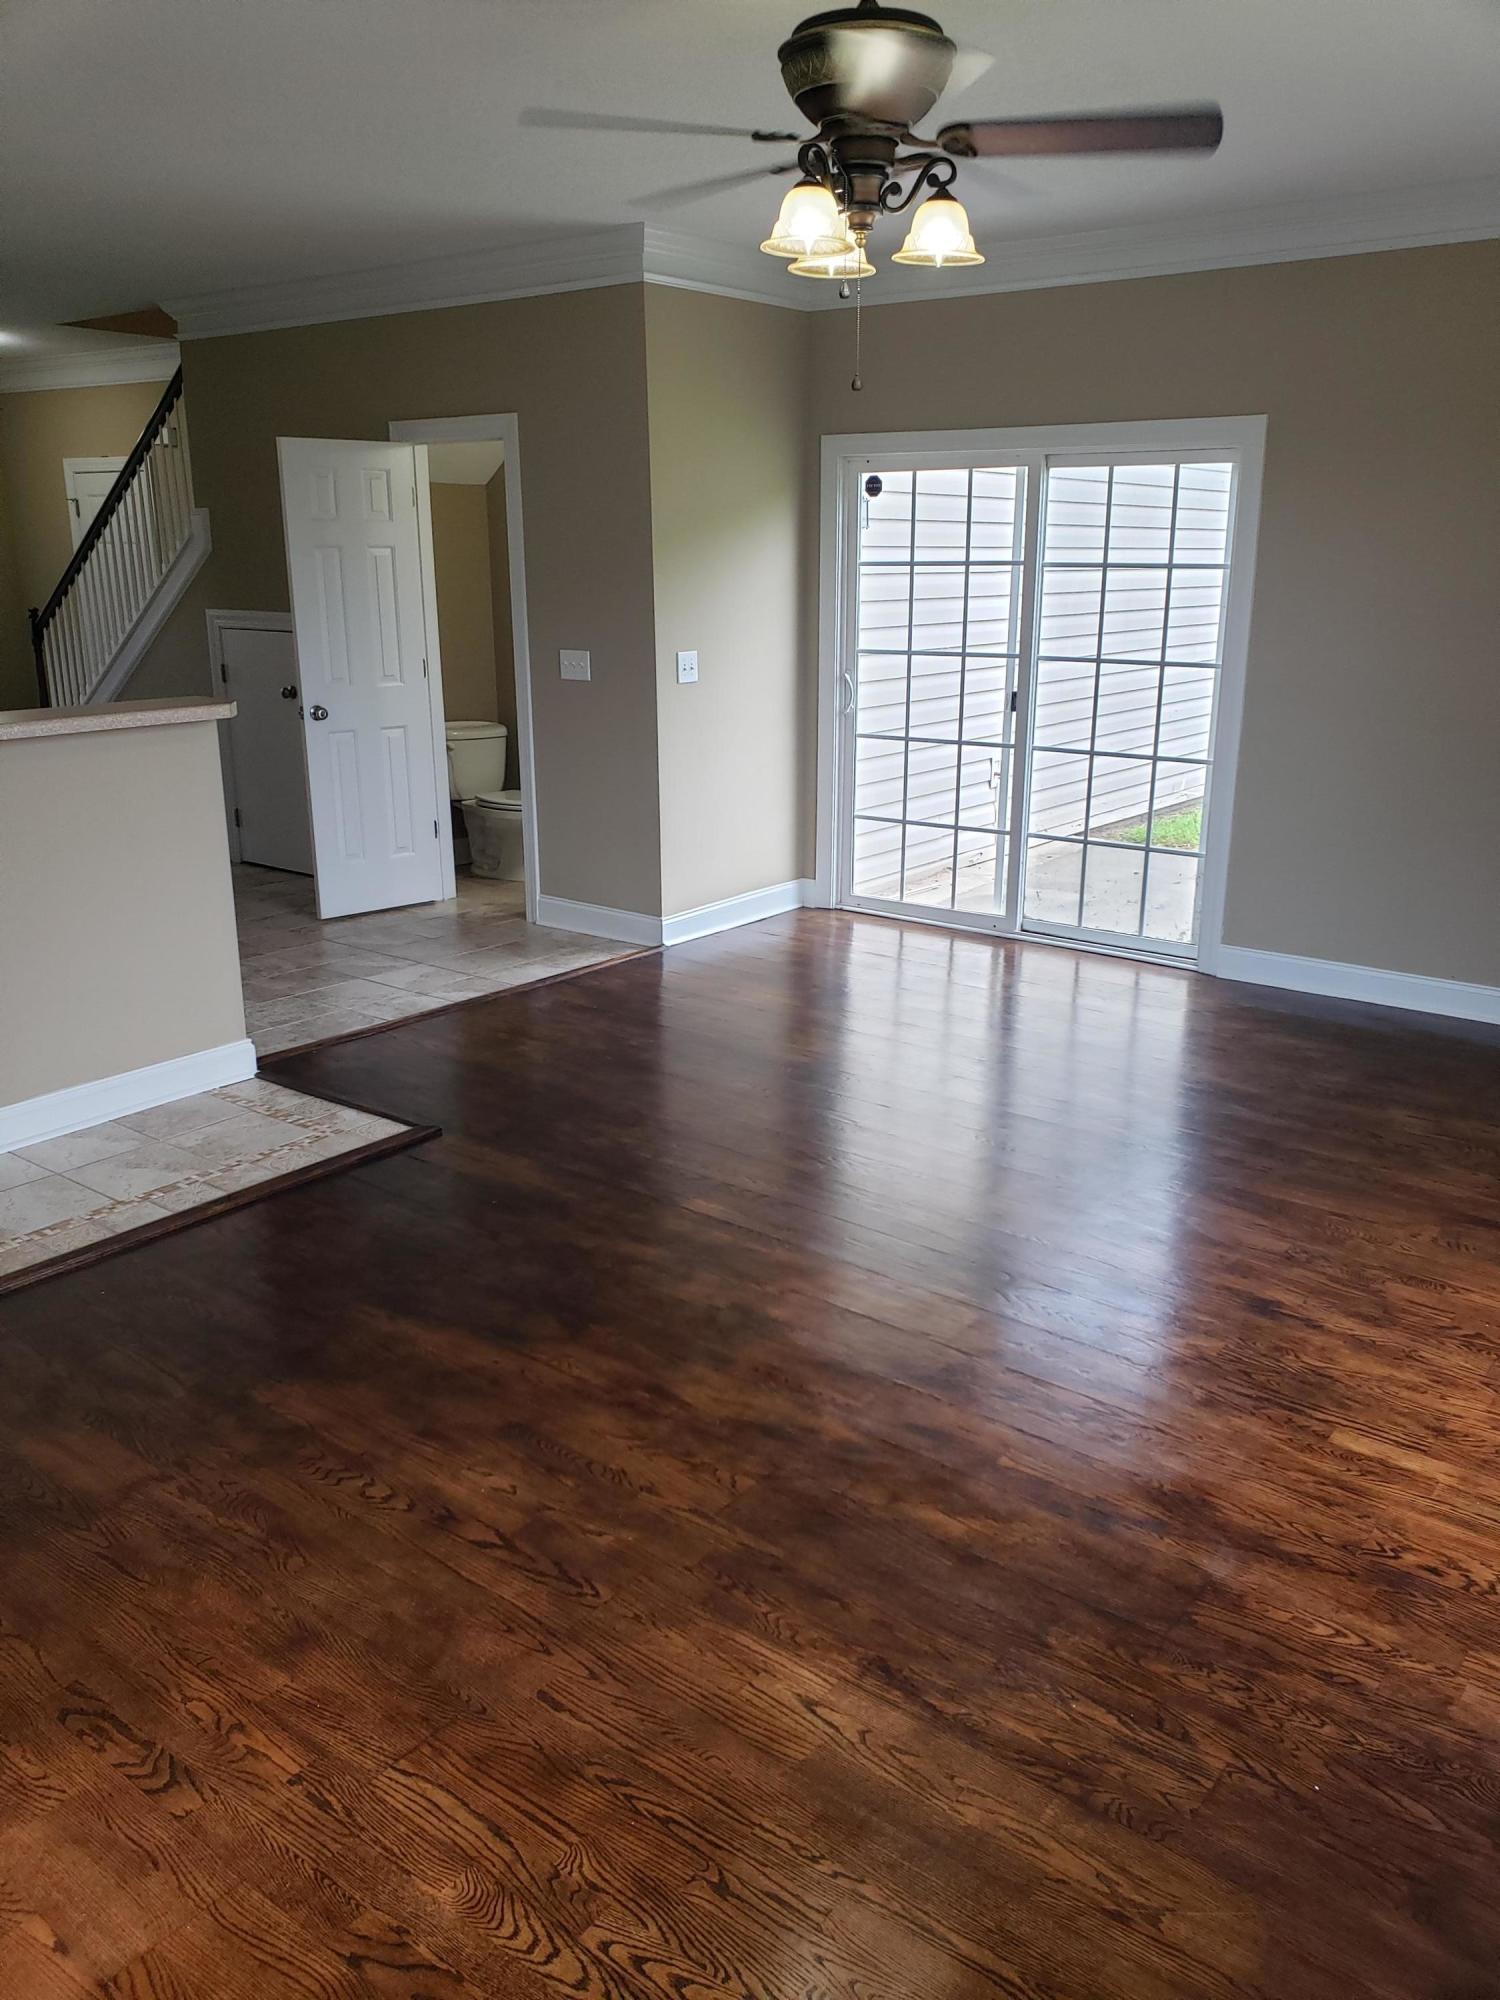 Montague Pointe Homes For Sale - 100 Gavins, Goose Creek, SC - 12